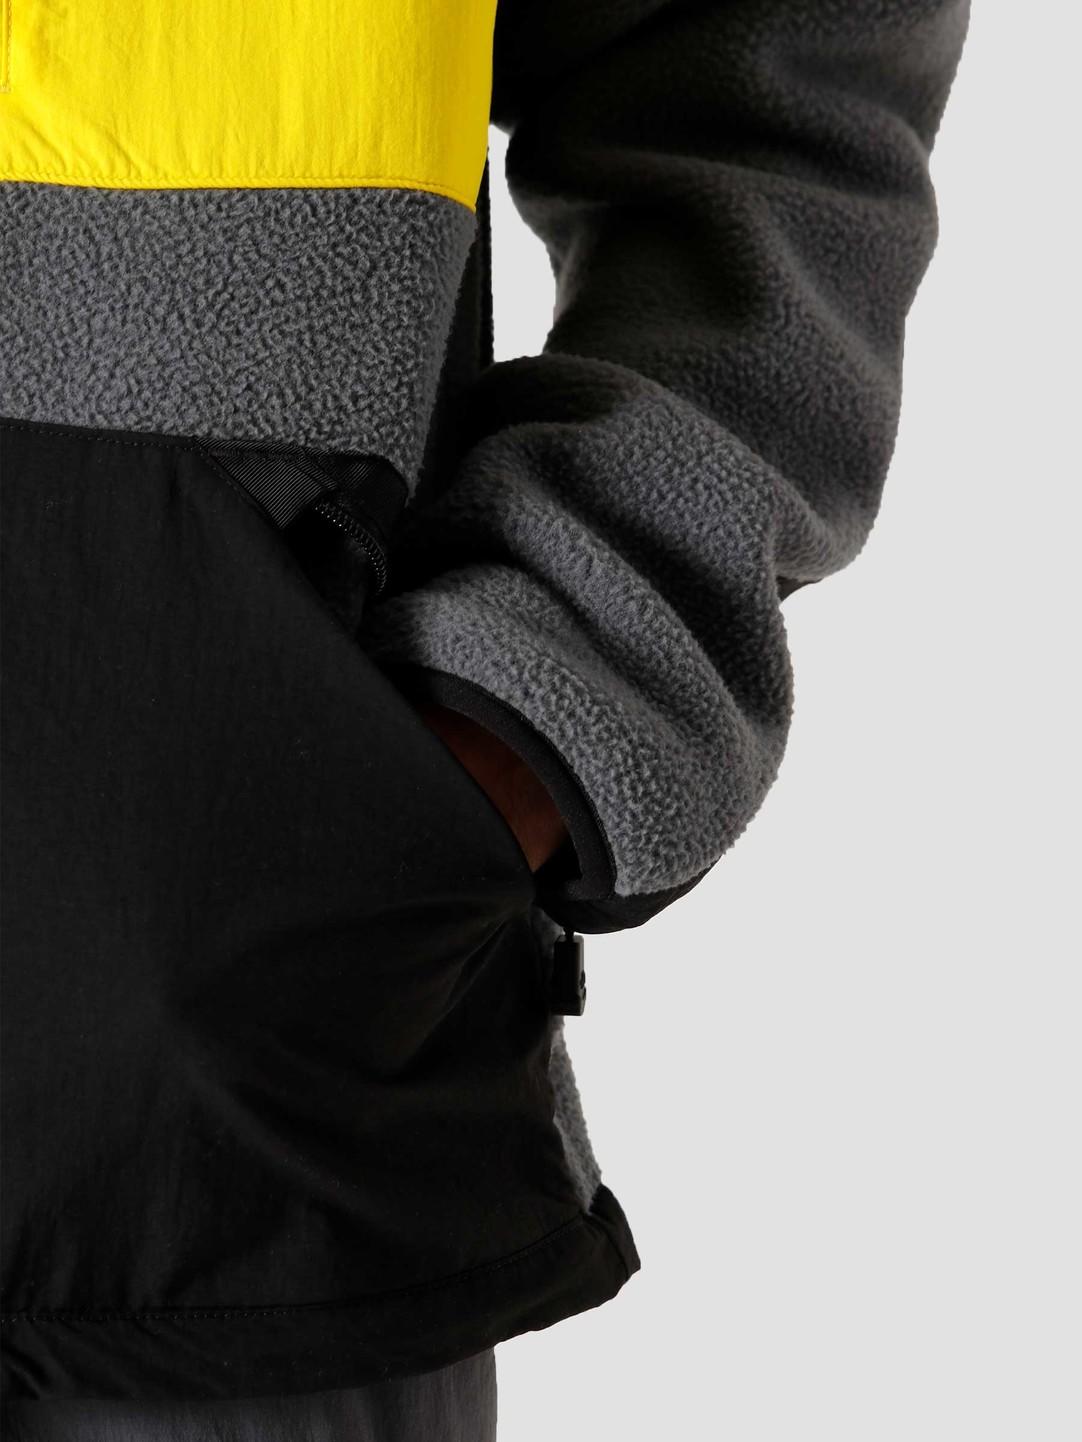 The North Face The North Face Steep Tech Full Zip Fleece Vanadis Grey Black Lightning Yellow NF0A4R6ASH3